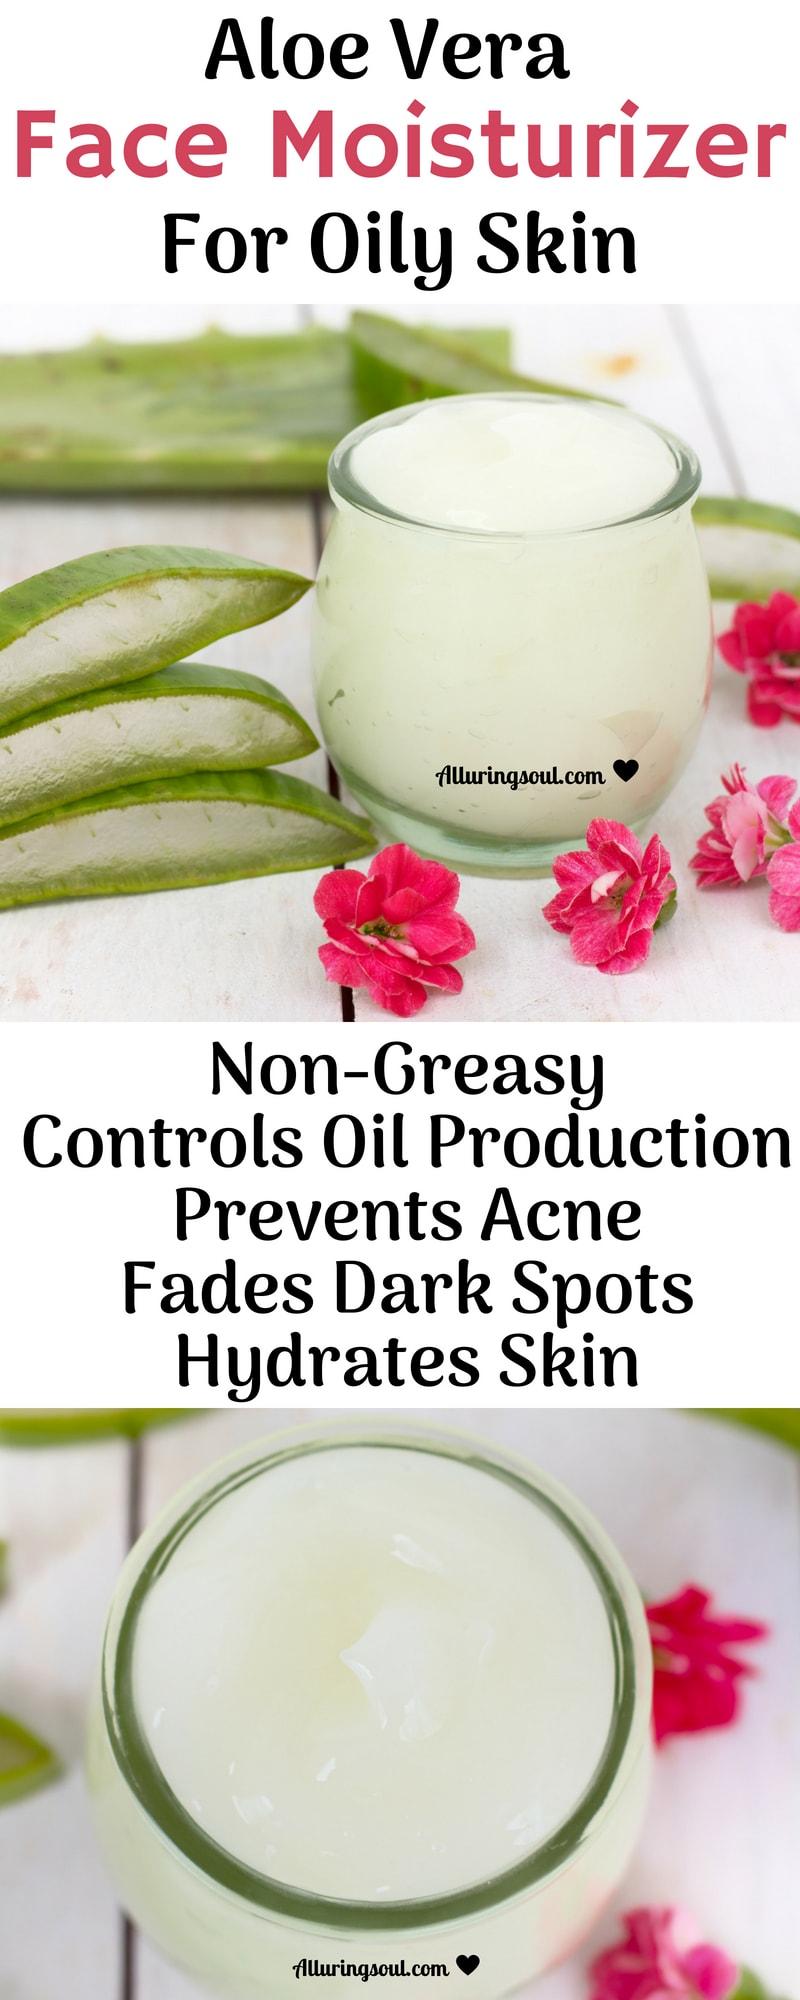 Aloe Vera Face Moisturizer For Oily Skin